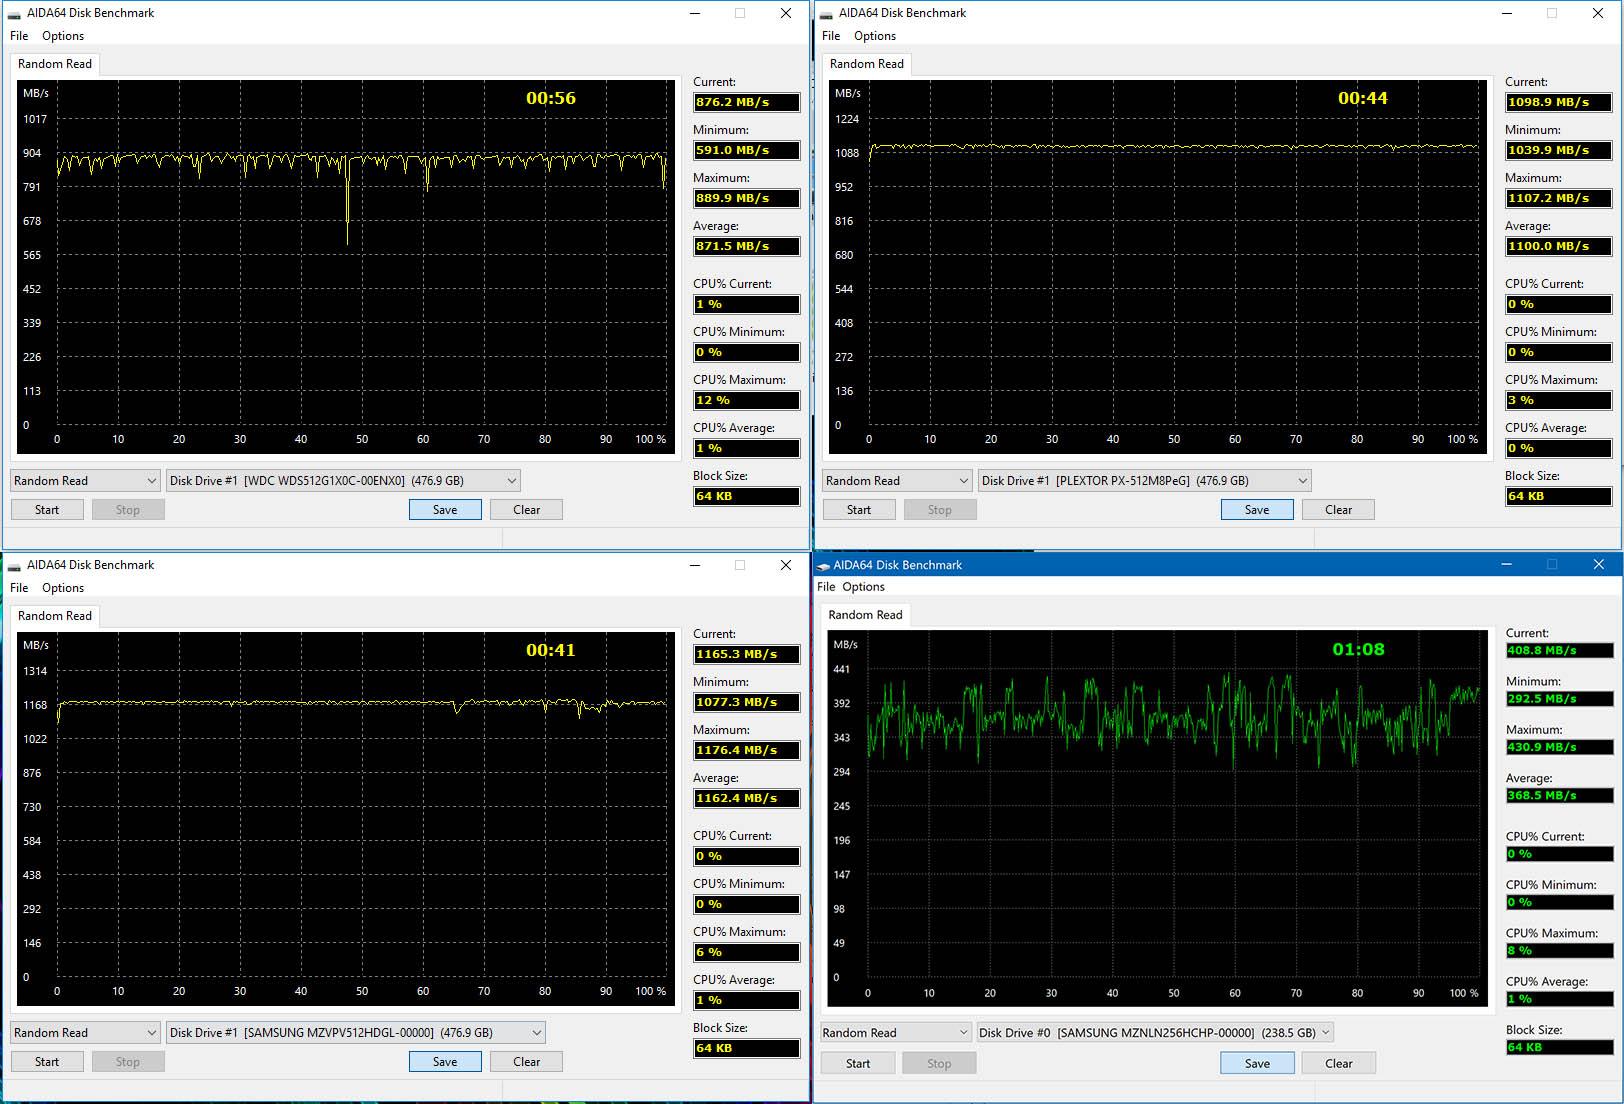 Random Read SSD Compare.jpg